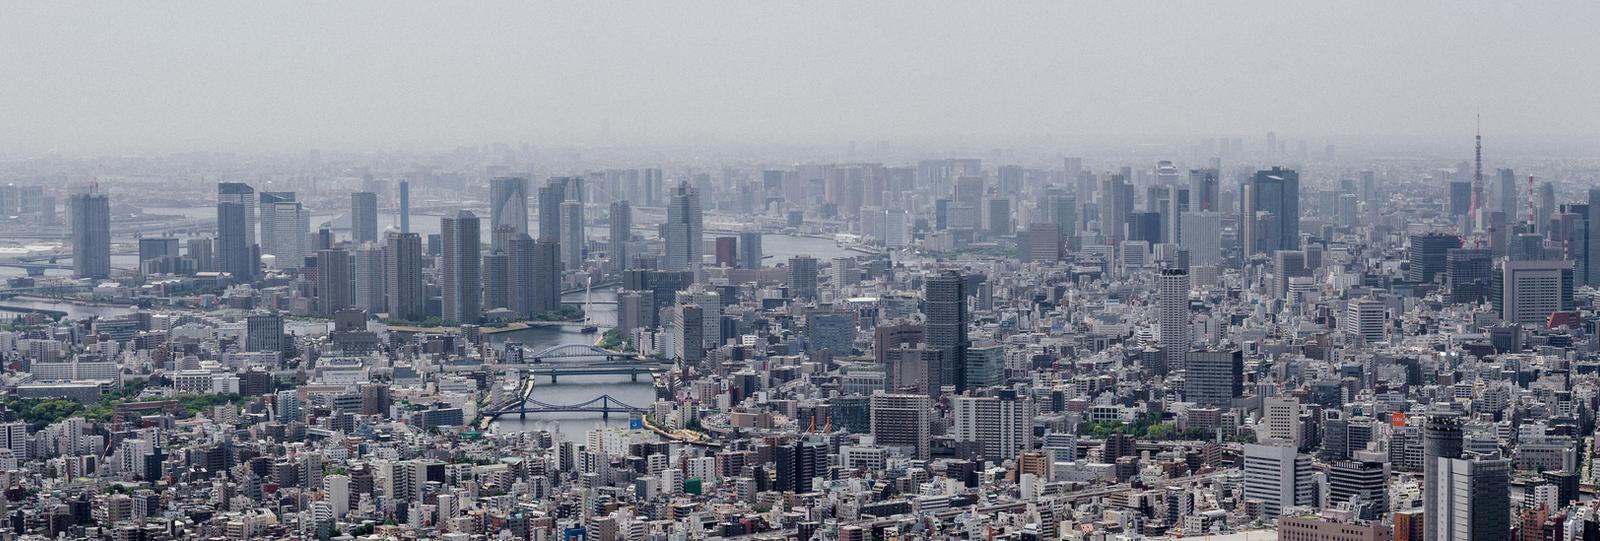 Tokyo Haze by MarcAndrePhoto